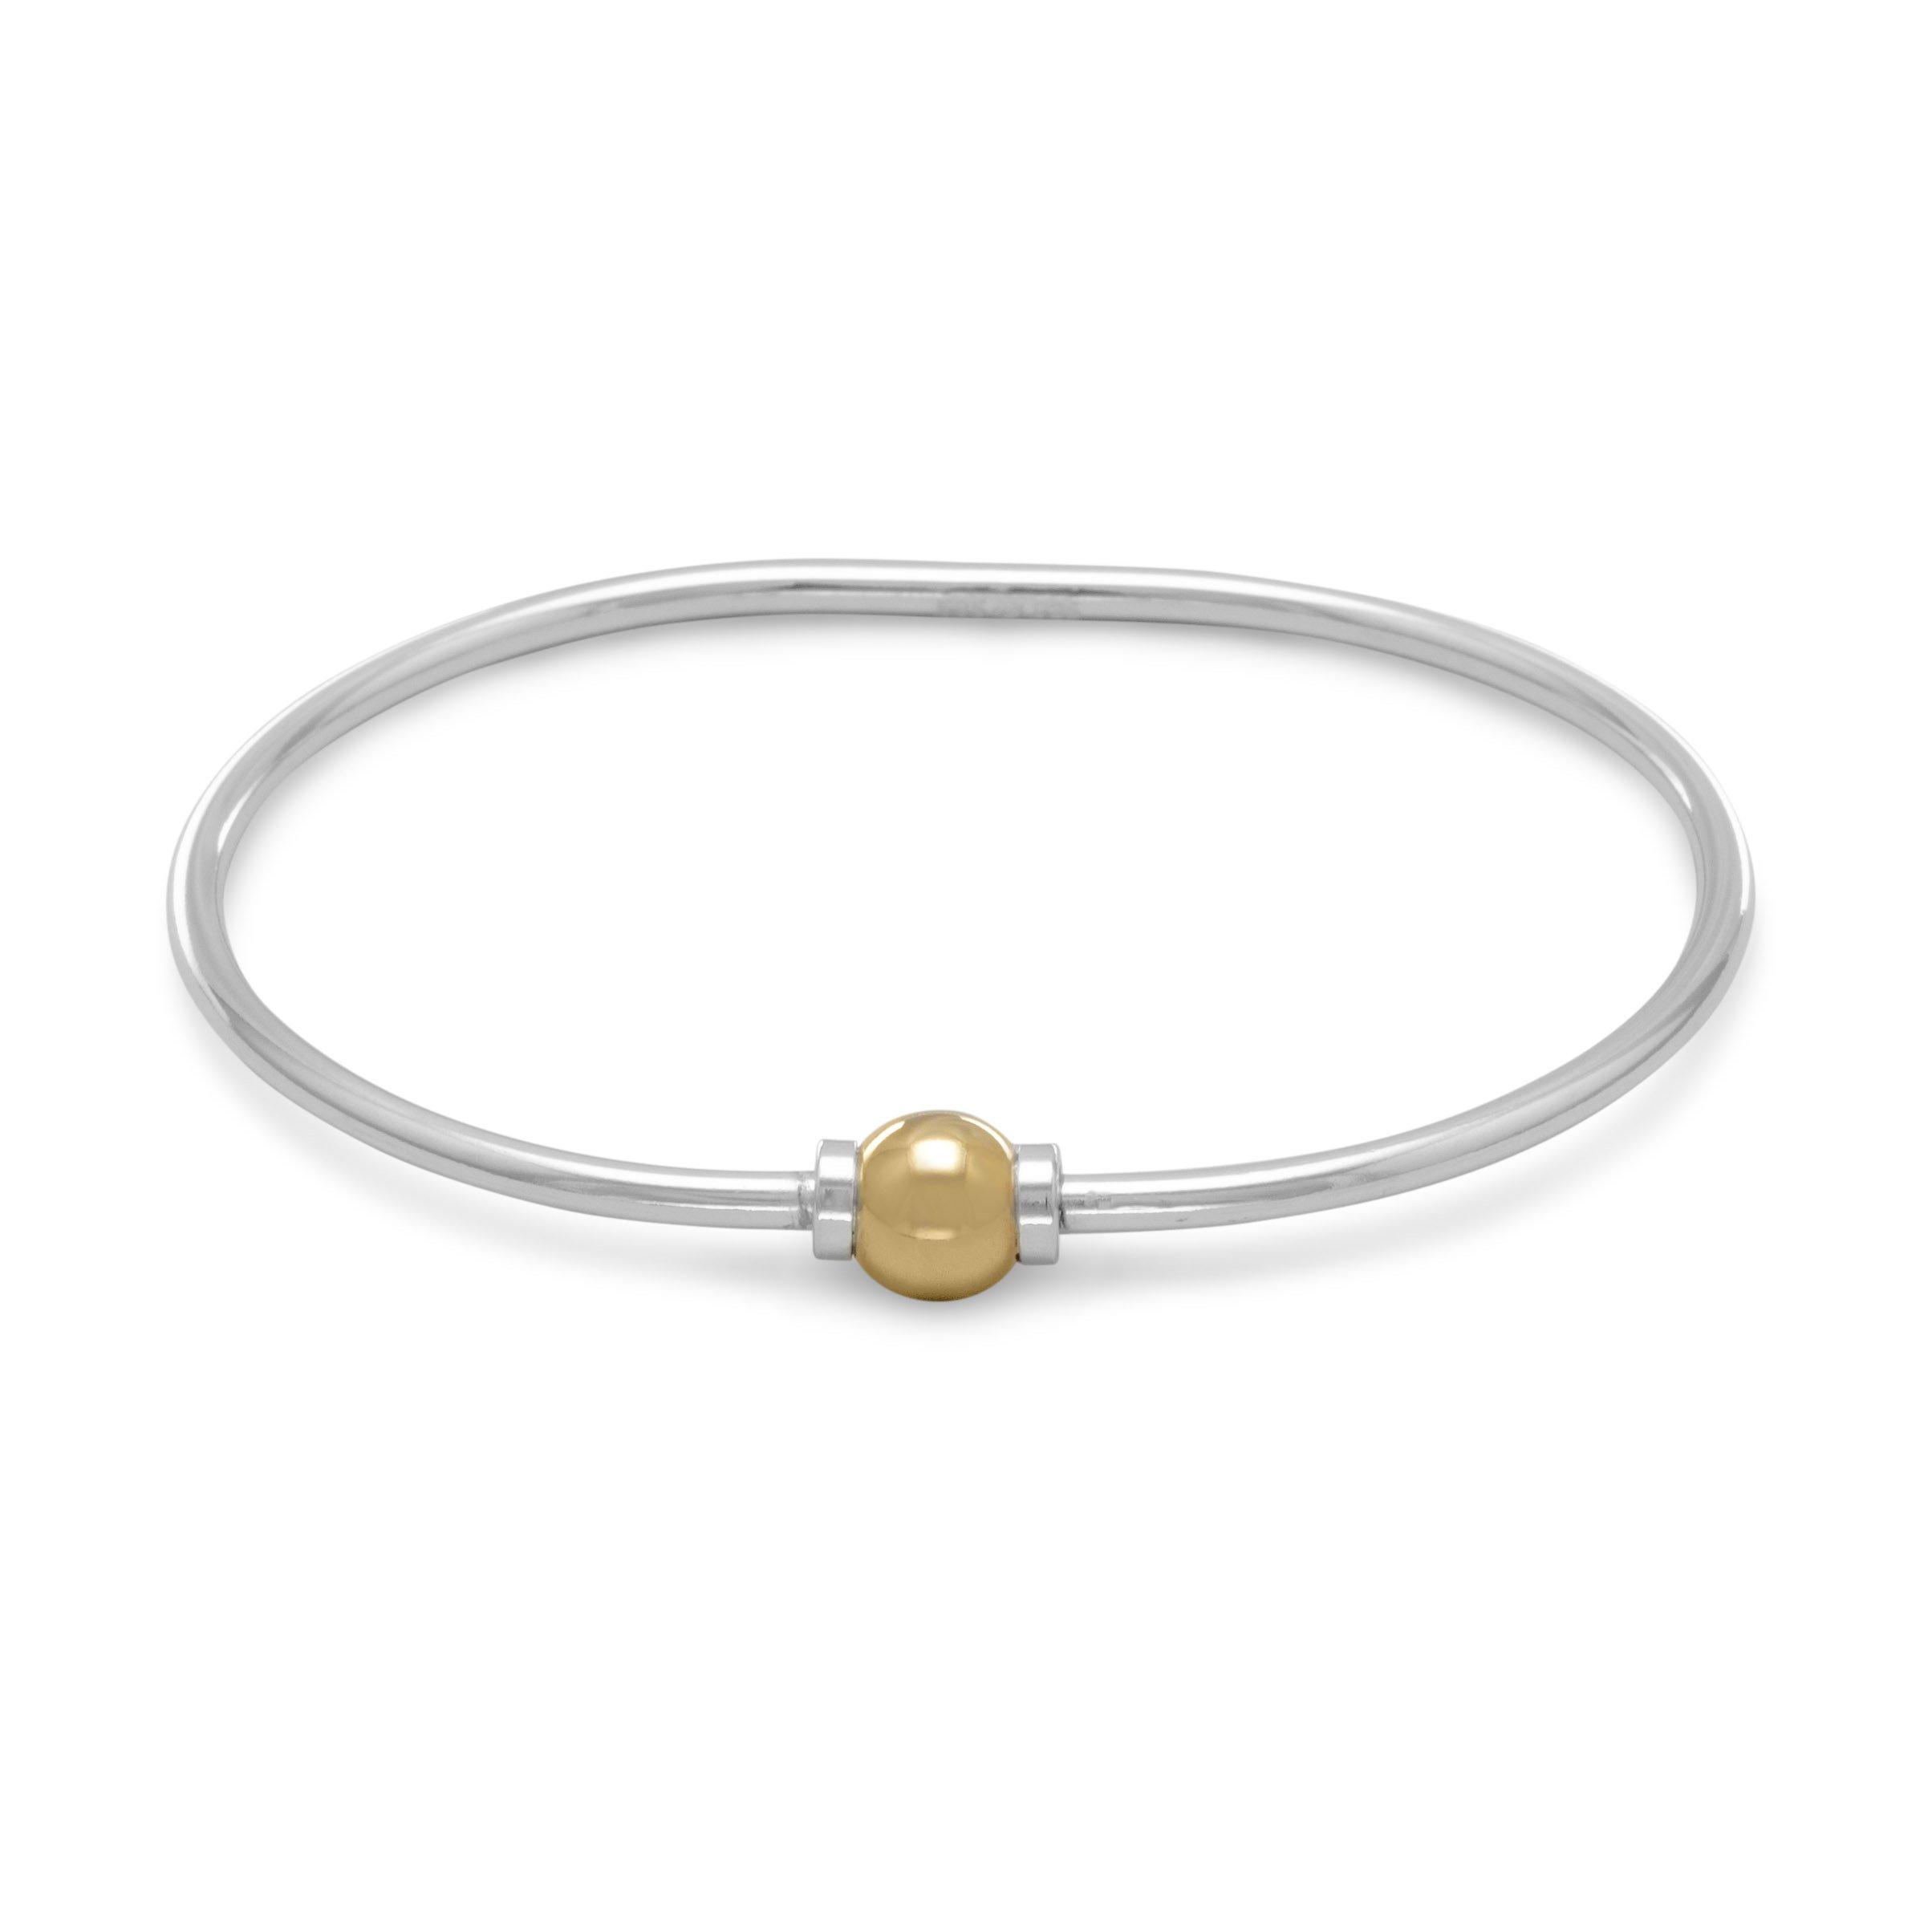 Openable 14K Gold/Sterling Silver Bangle Bracelet, 2.2mm, 7.5mm Bead, 7-1/2 inch